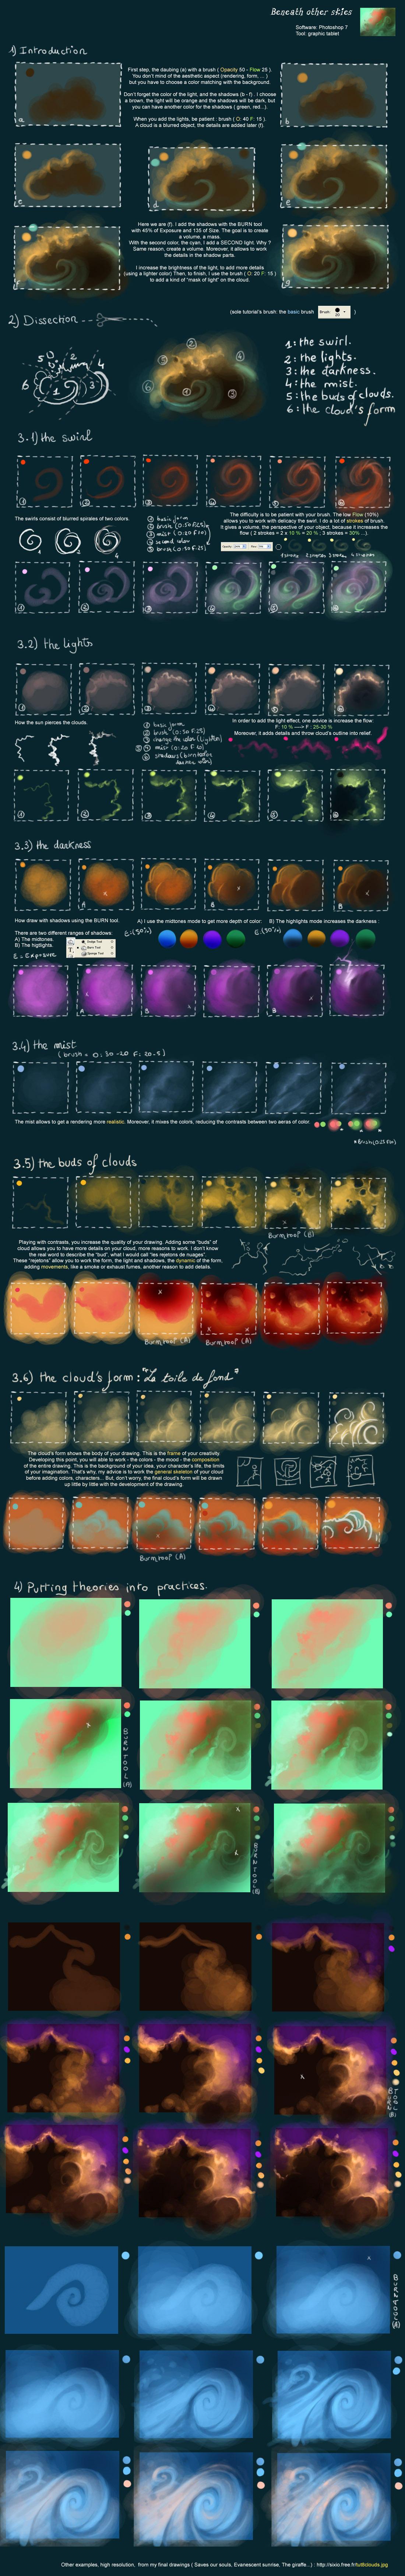 Tutorial 8 Beneath other skies by AquaSixio